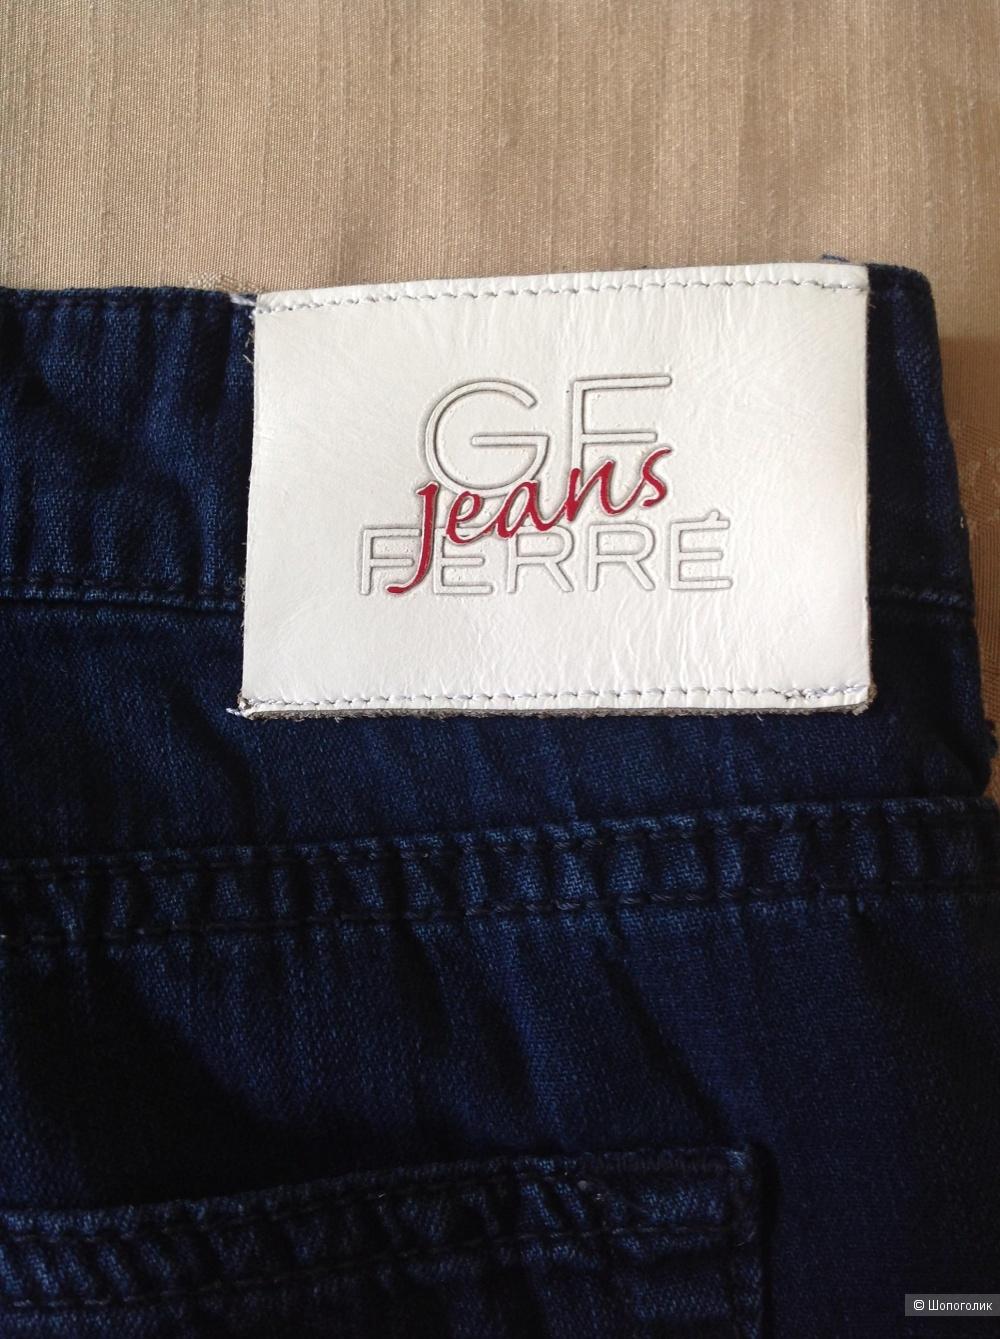 Джинсы GF Ferre, размер 33, на 48-50-52